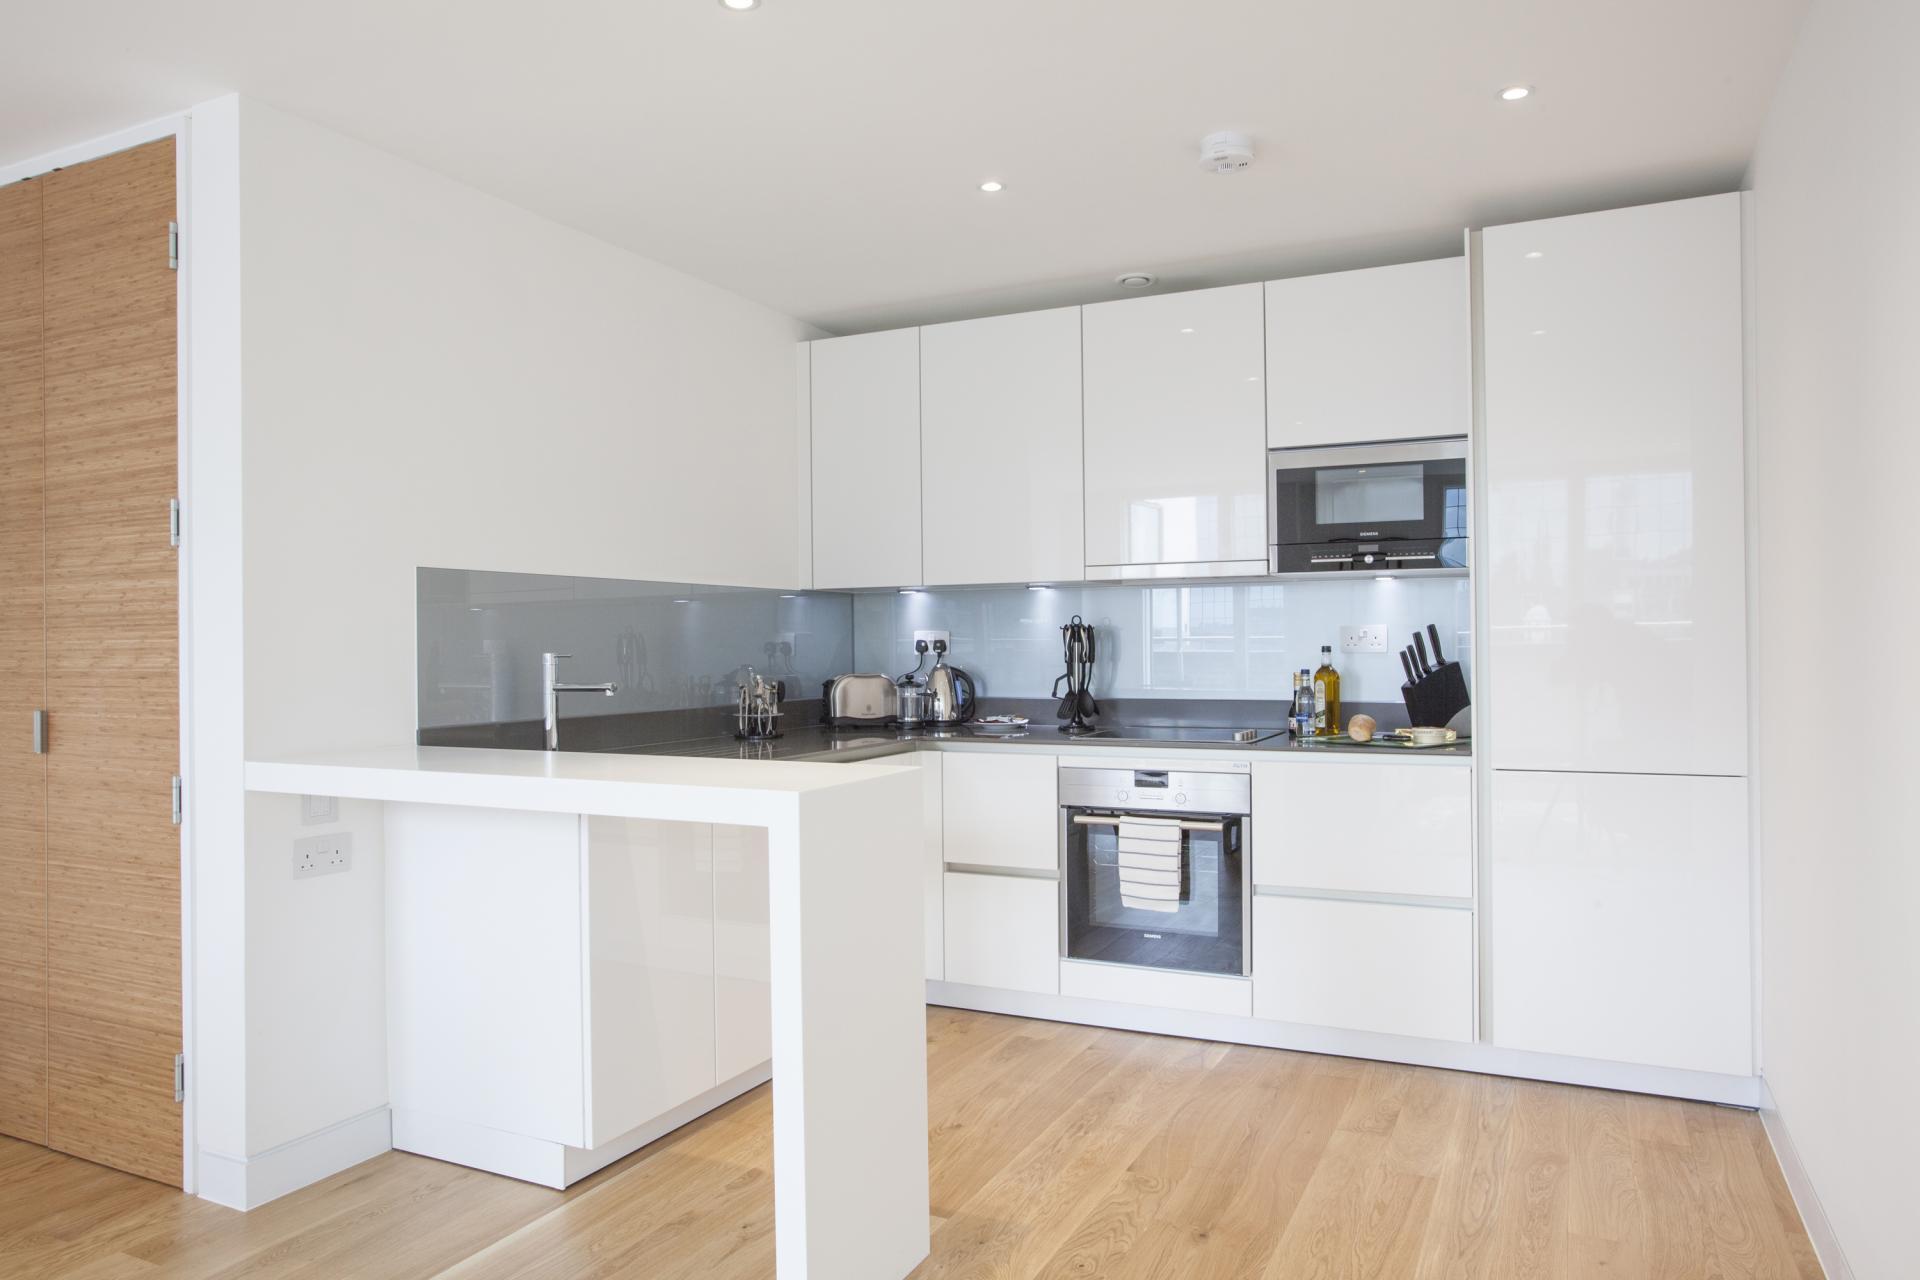 Kitchen at London Square Apartments